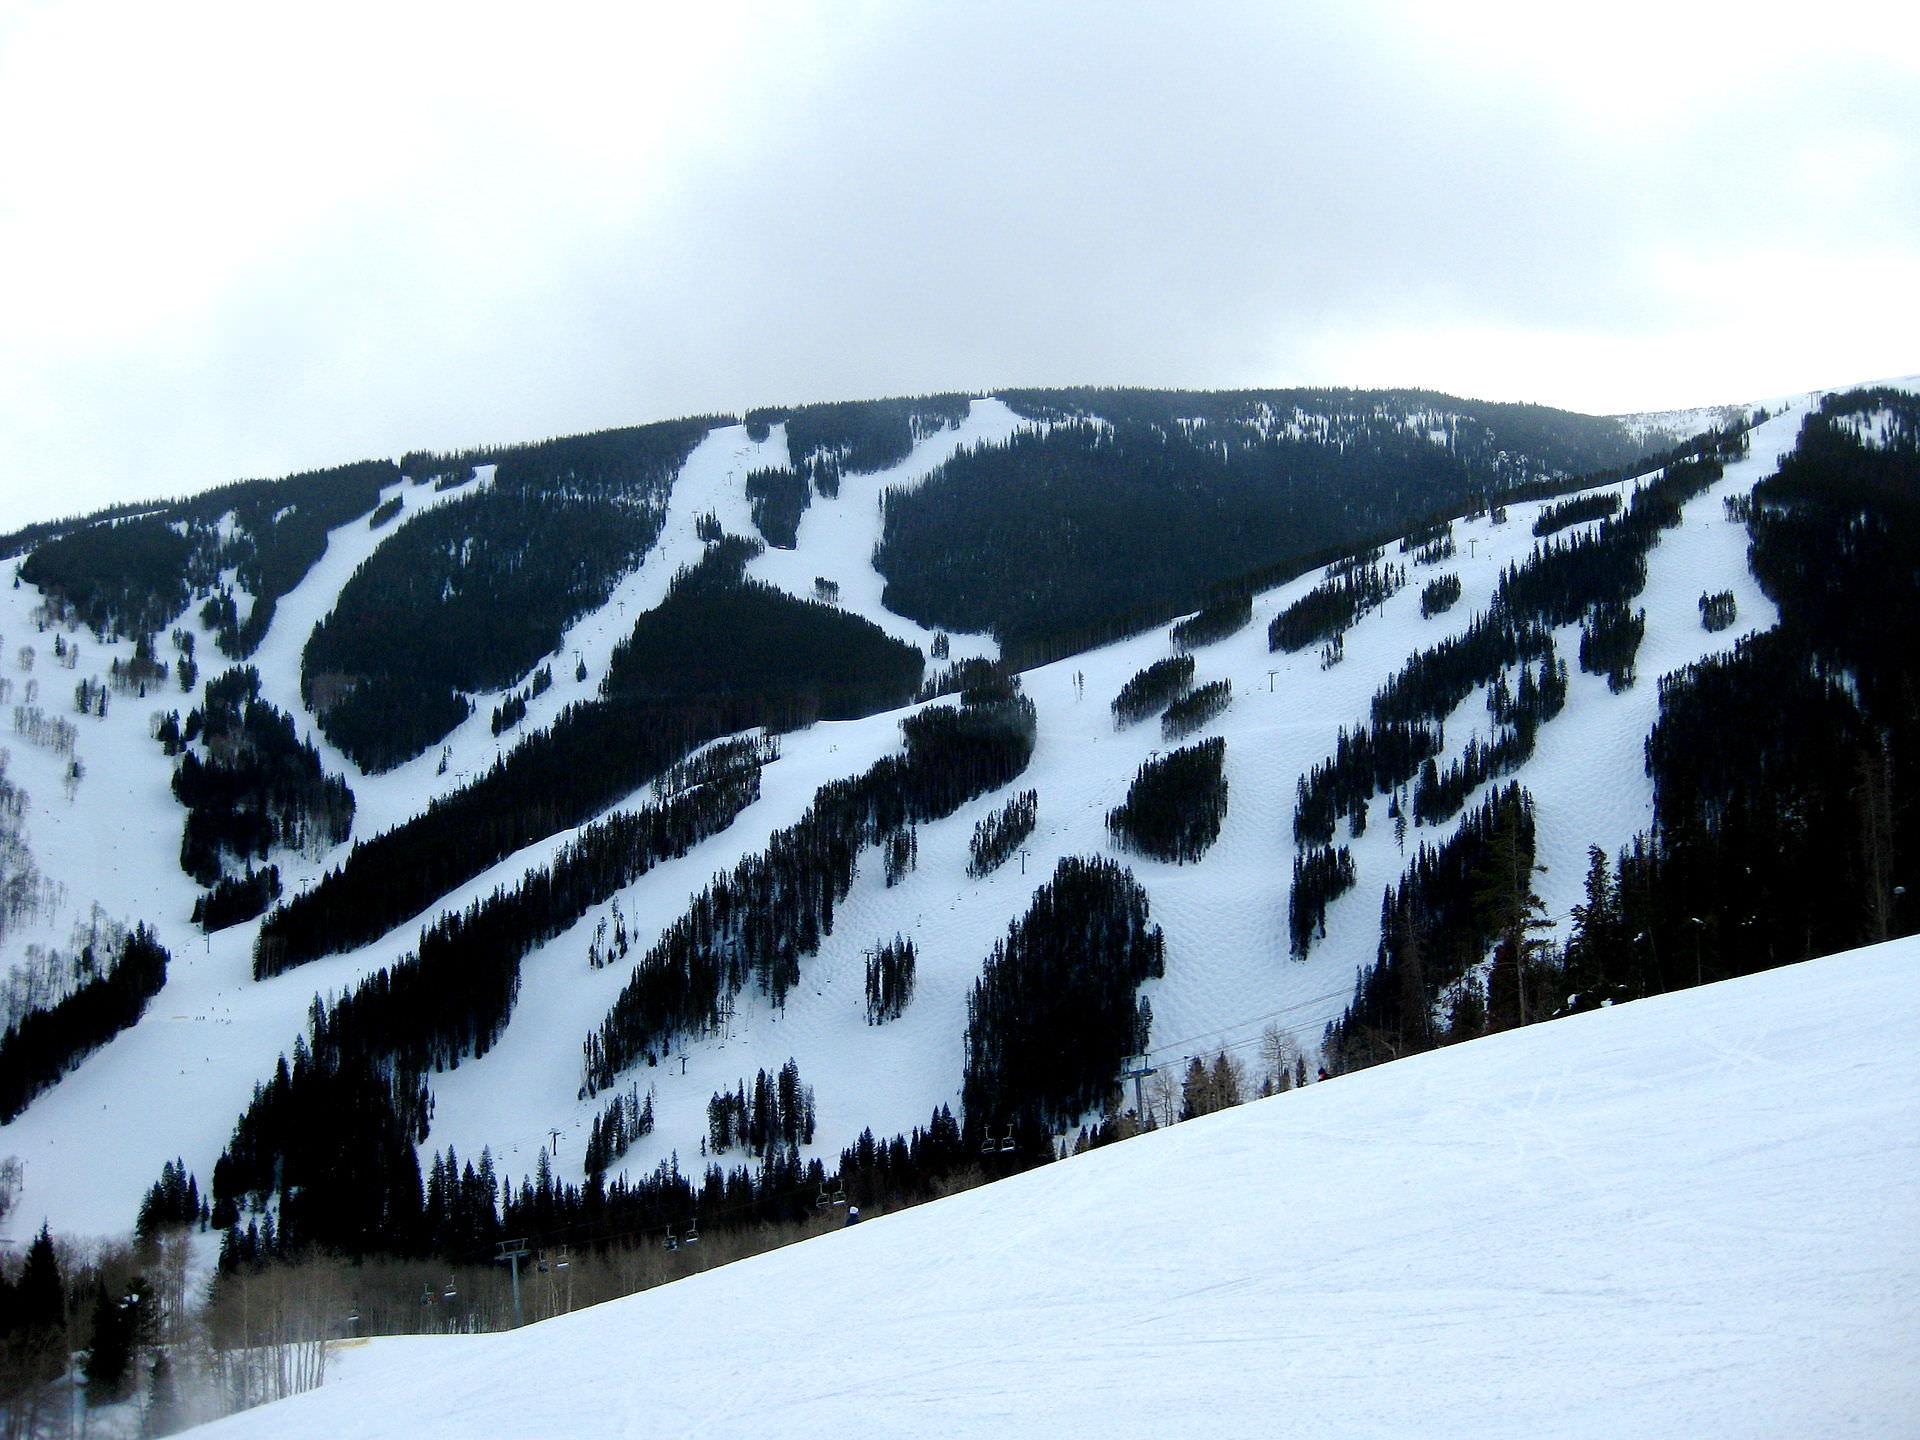 Birds_of_Prey_(ski_course),_Beaver_Creek